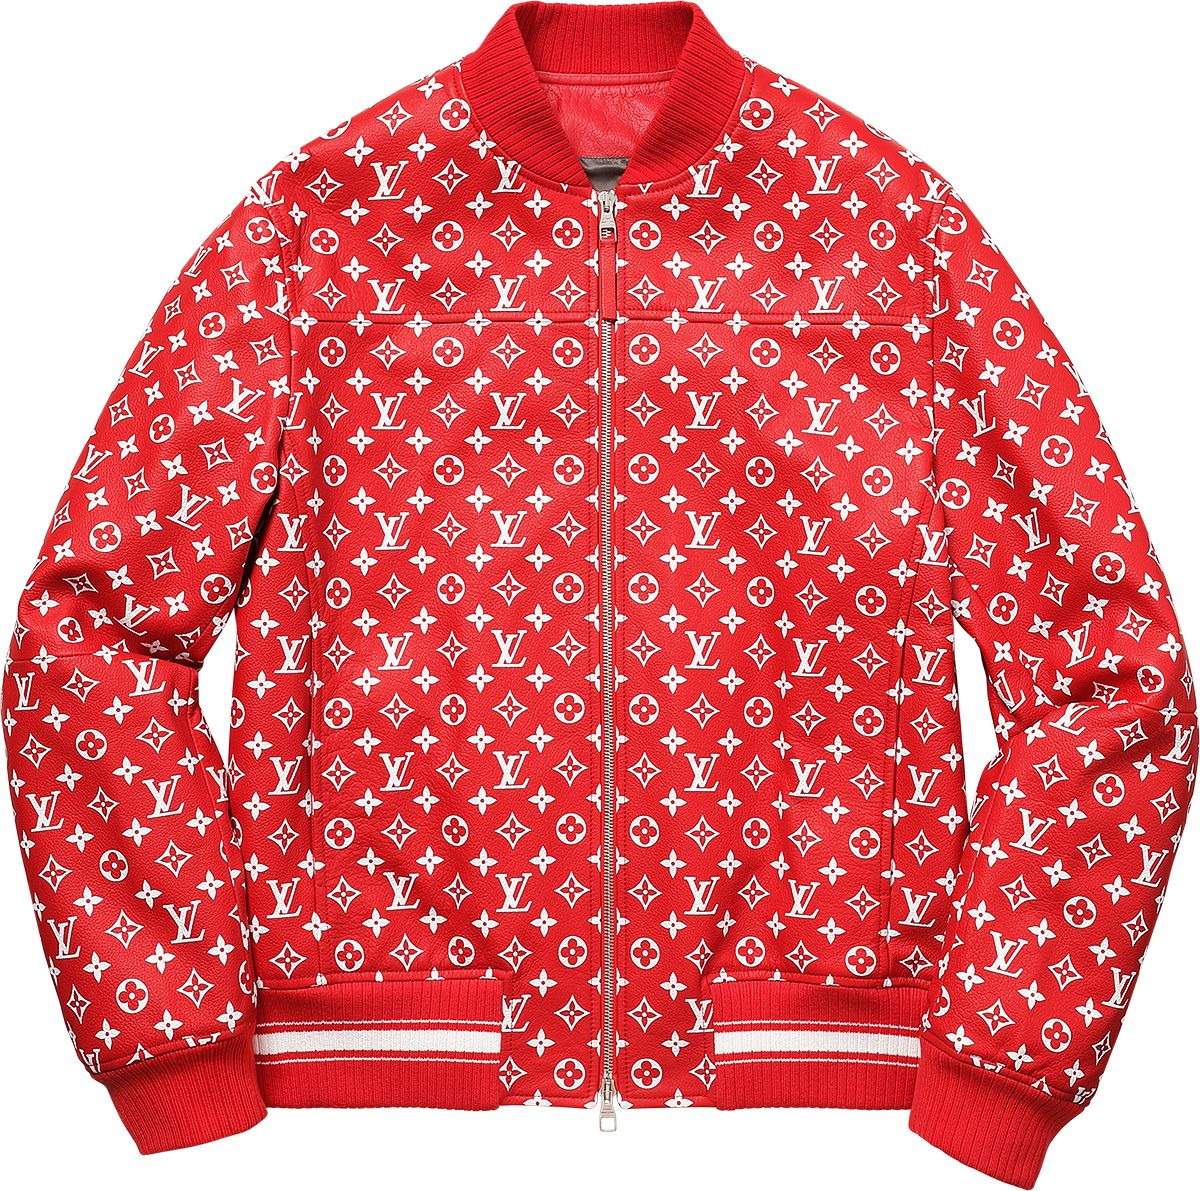 482b5416 Louis Vuitton x Supreme: 8 Jackets for Fall/Winter 2017 - EU Kicks: Sneaker  Magazine